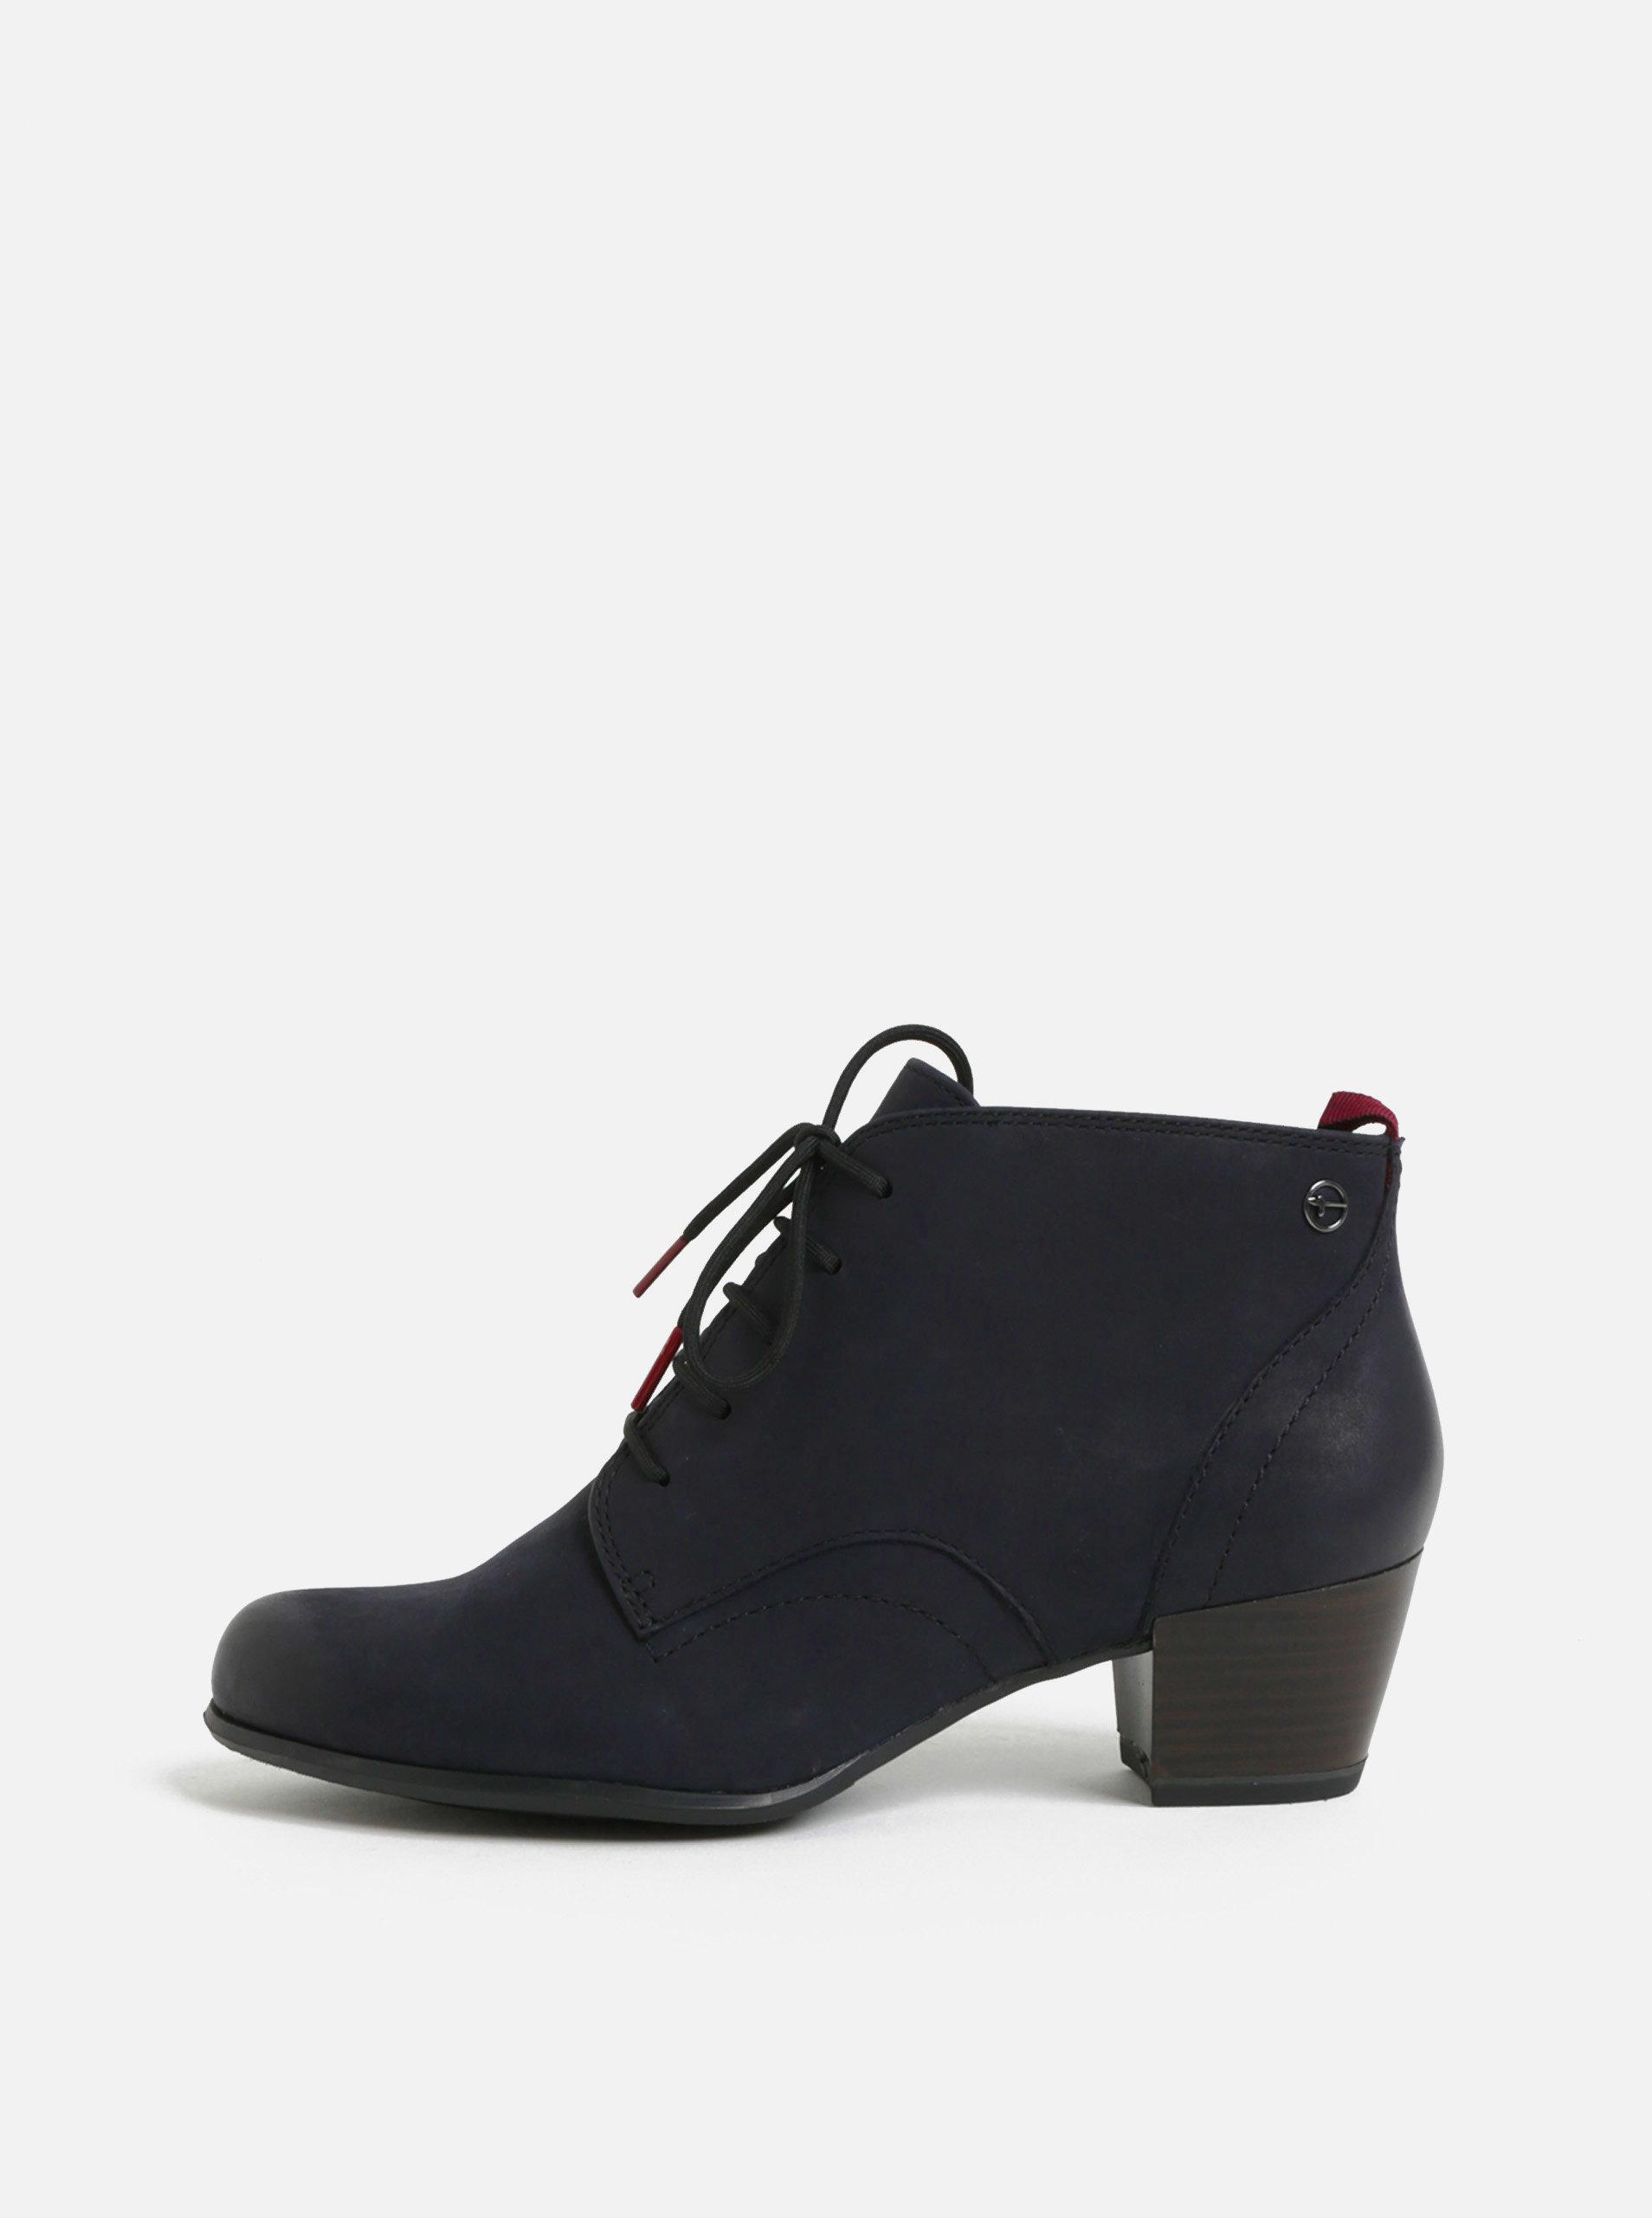 7e303706ec8a Tmavě modré kožené kotníkové boty Tamaris ...